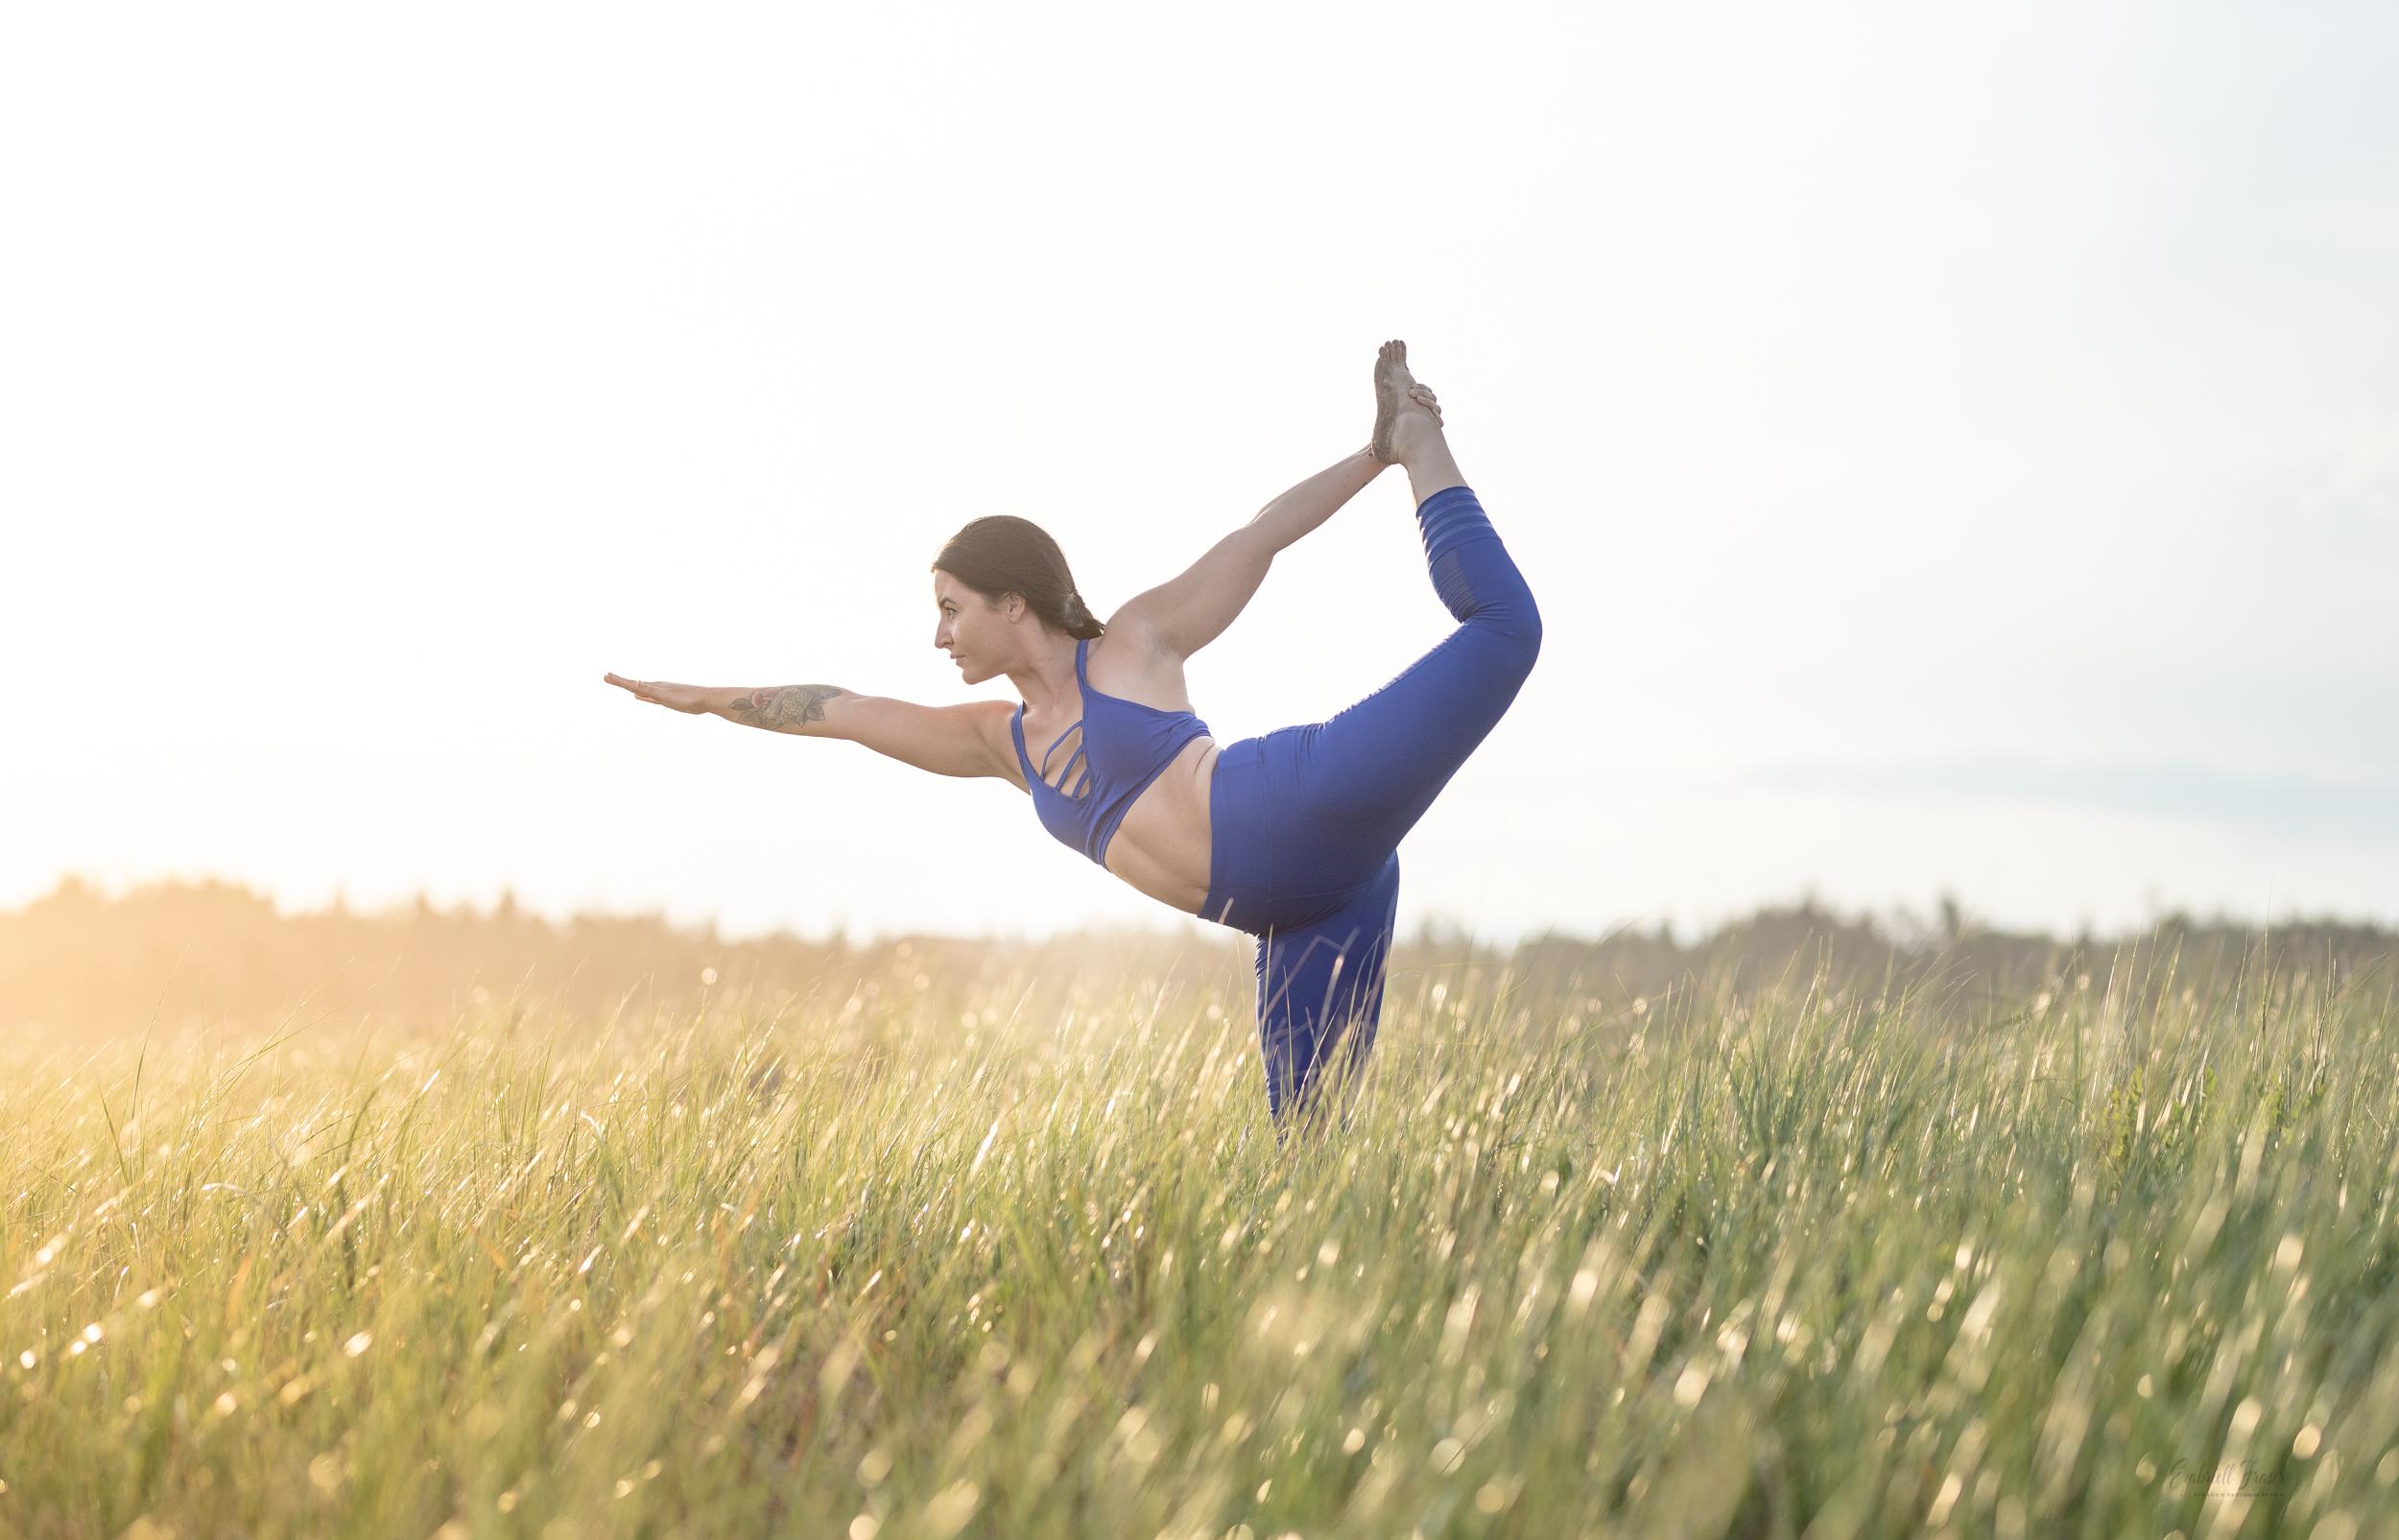 Yoga-Oxygen Yoga-Ezabriell Fraser - Briell Fraser -- Fraser Photography Dartmouth/Halifax, Nova Scotia -- Portrait